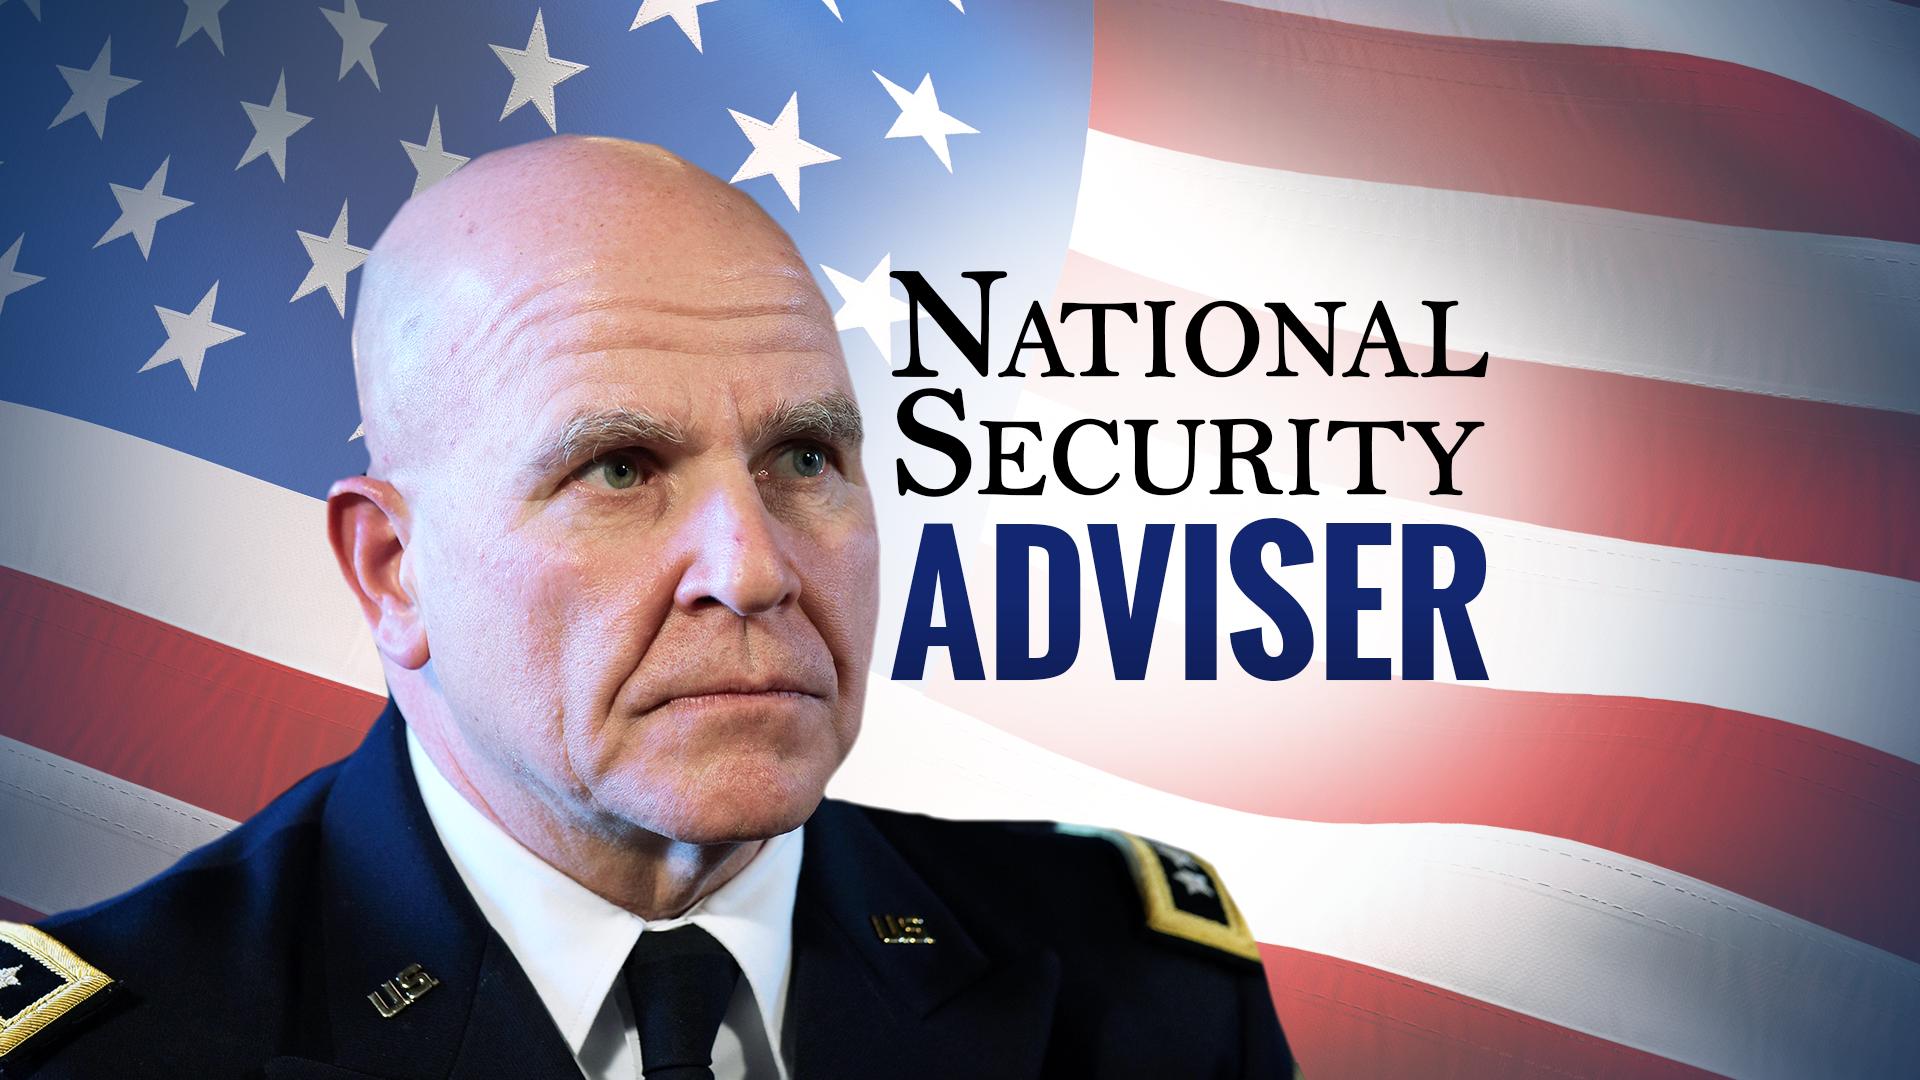 national-security-adviser_189420